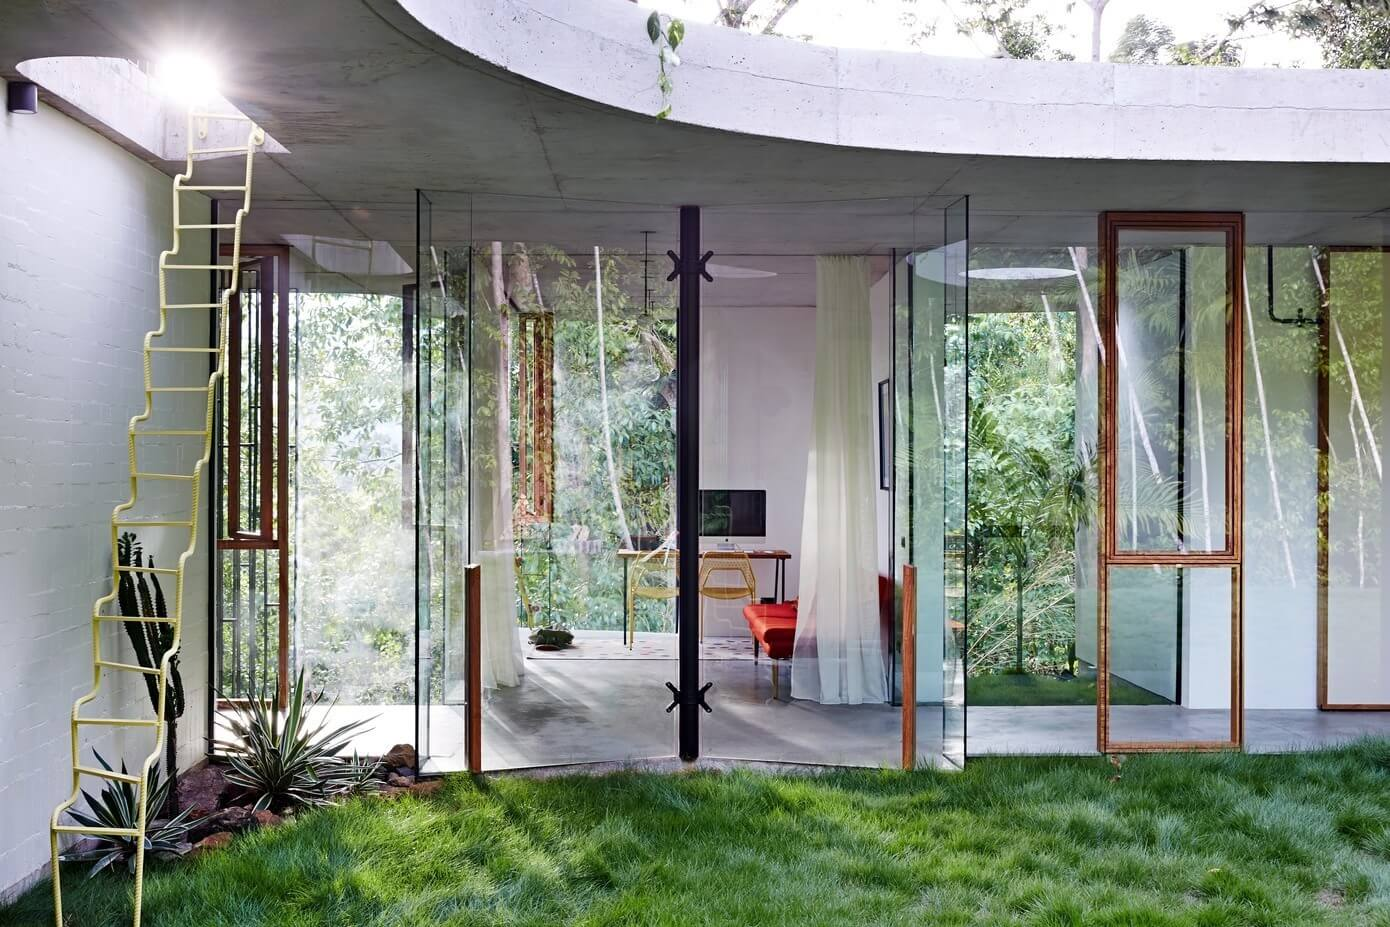 planchonella-house-jesse-bennett-architect-20